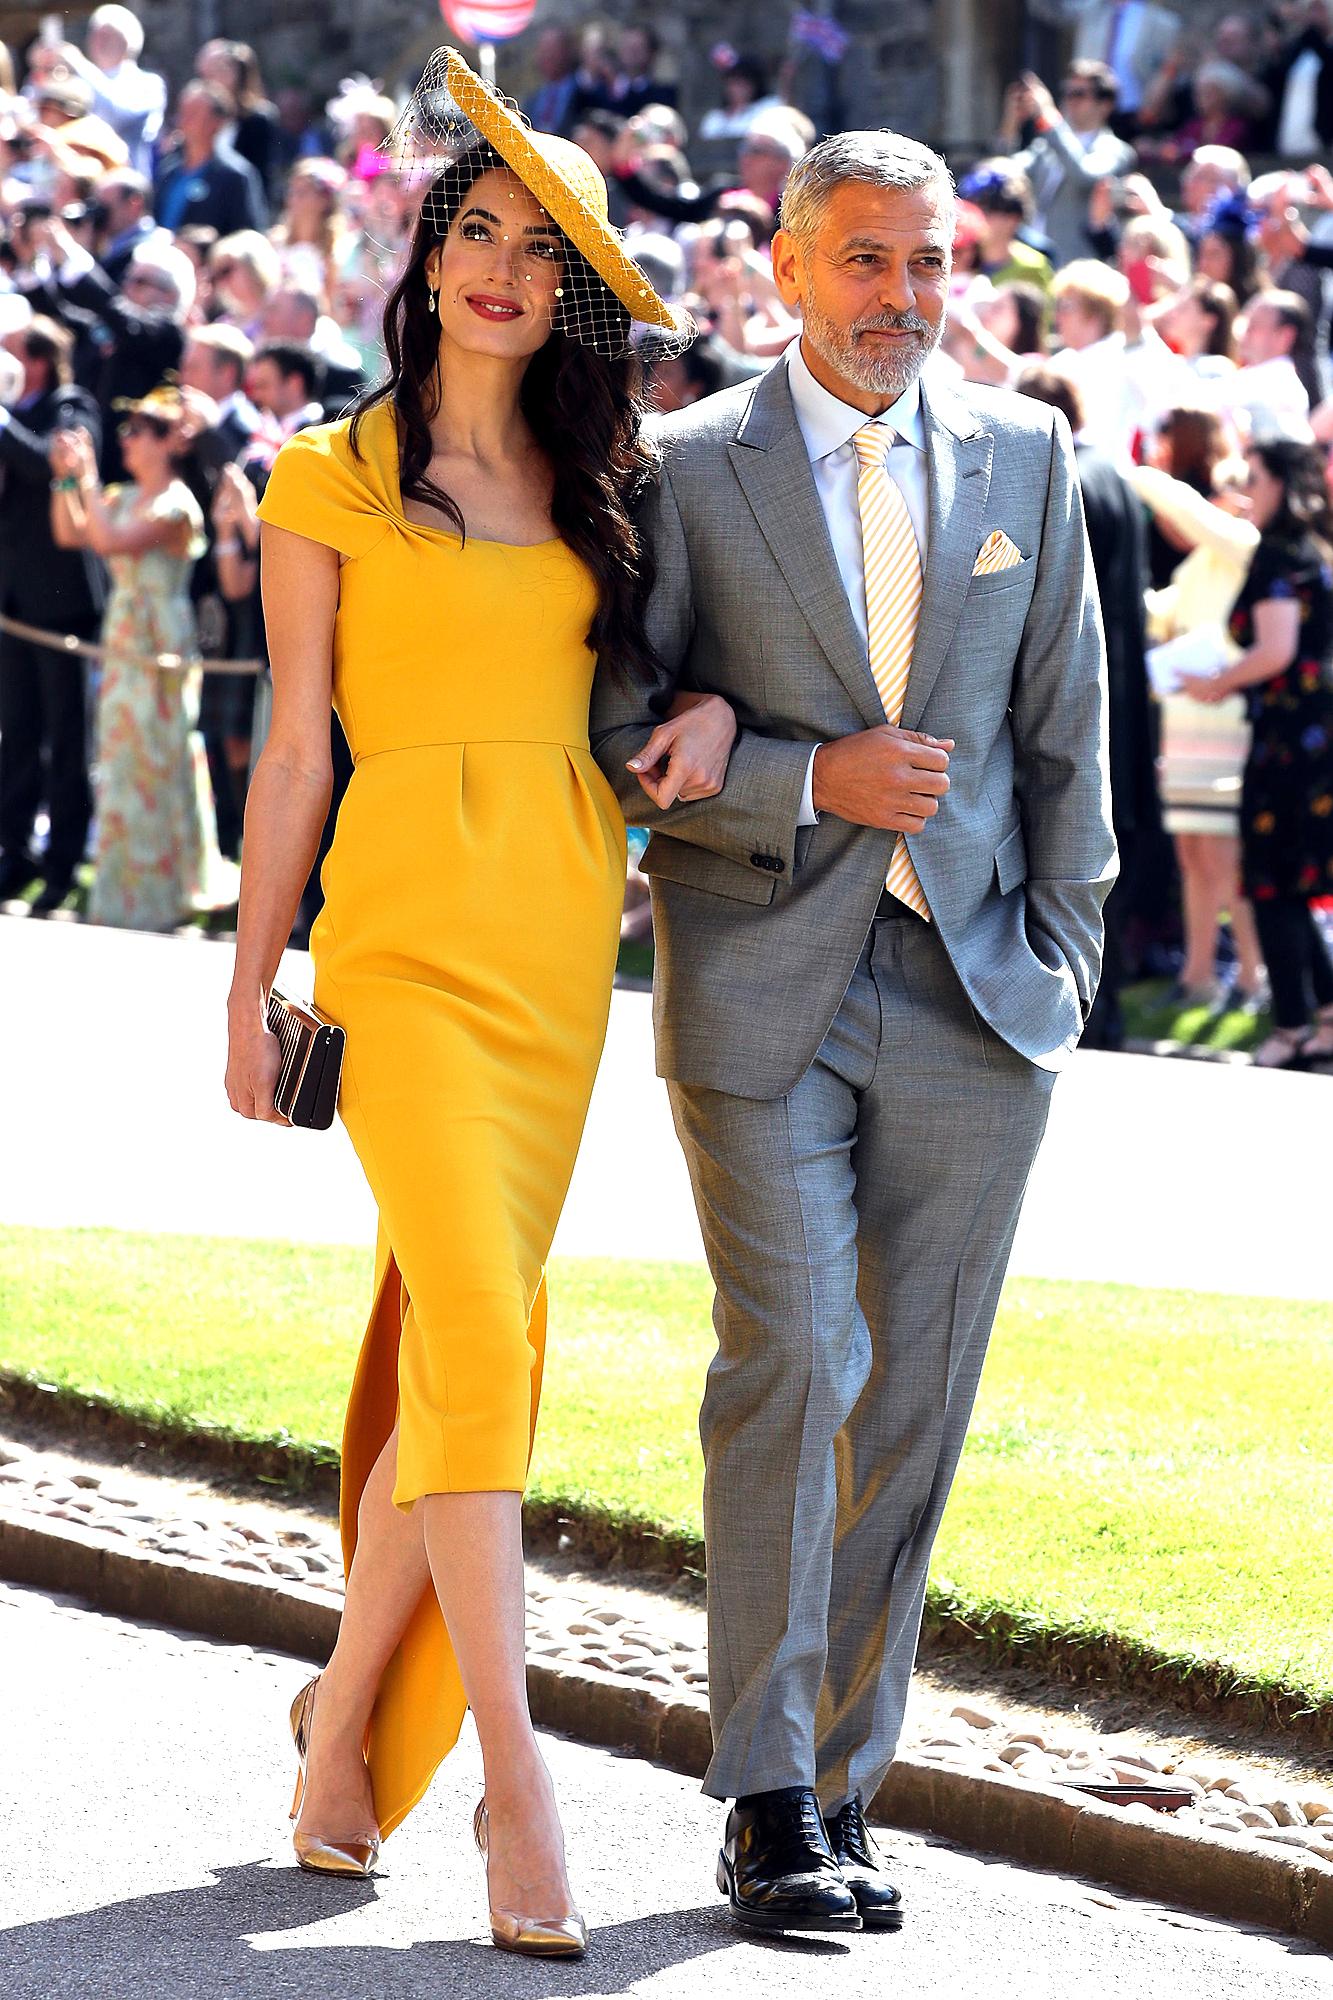 Prince Harry Marries Ms. Meghan Markle Windsor Castle